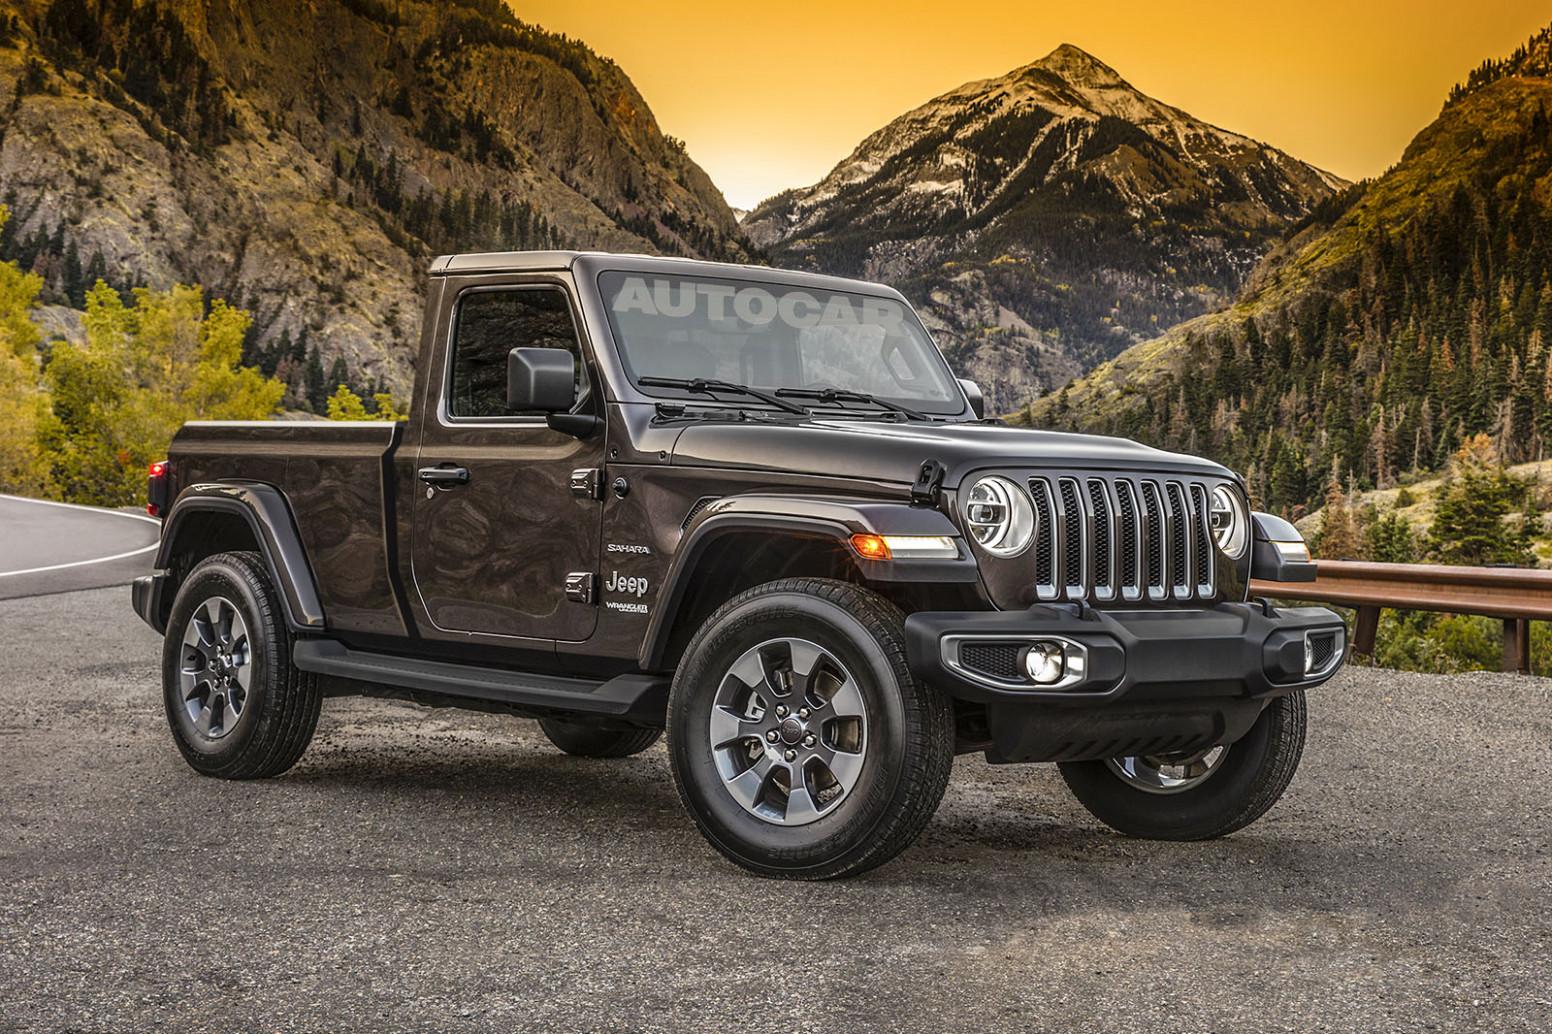 Model Jeep Wrangler Unlimited 2022